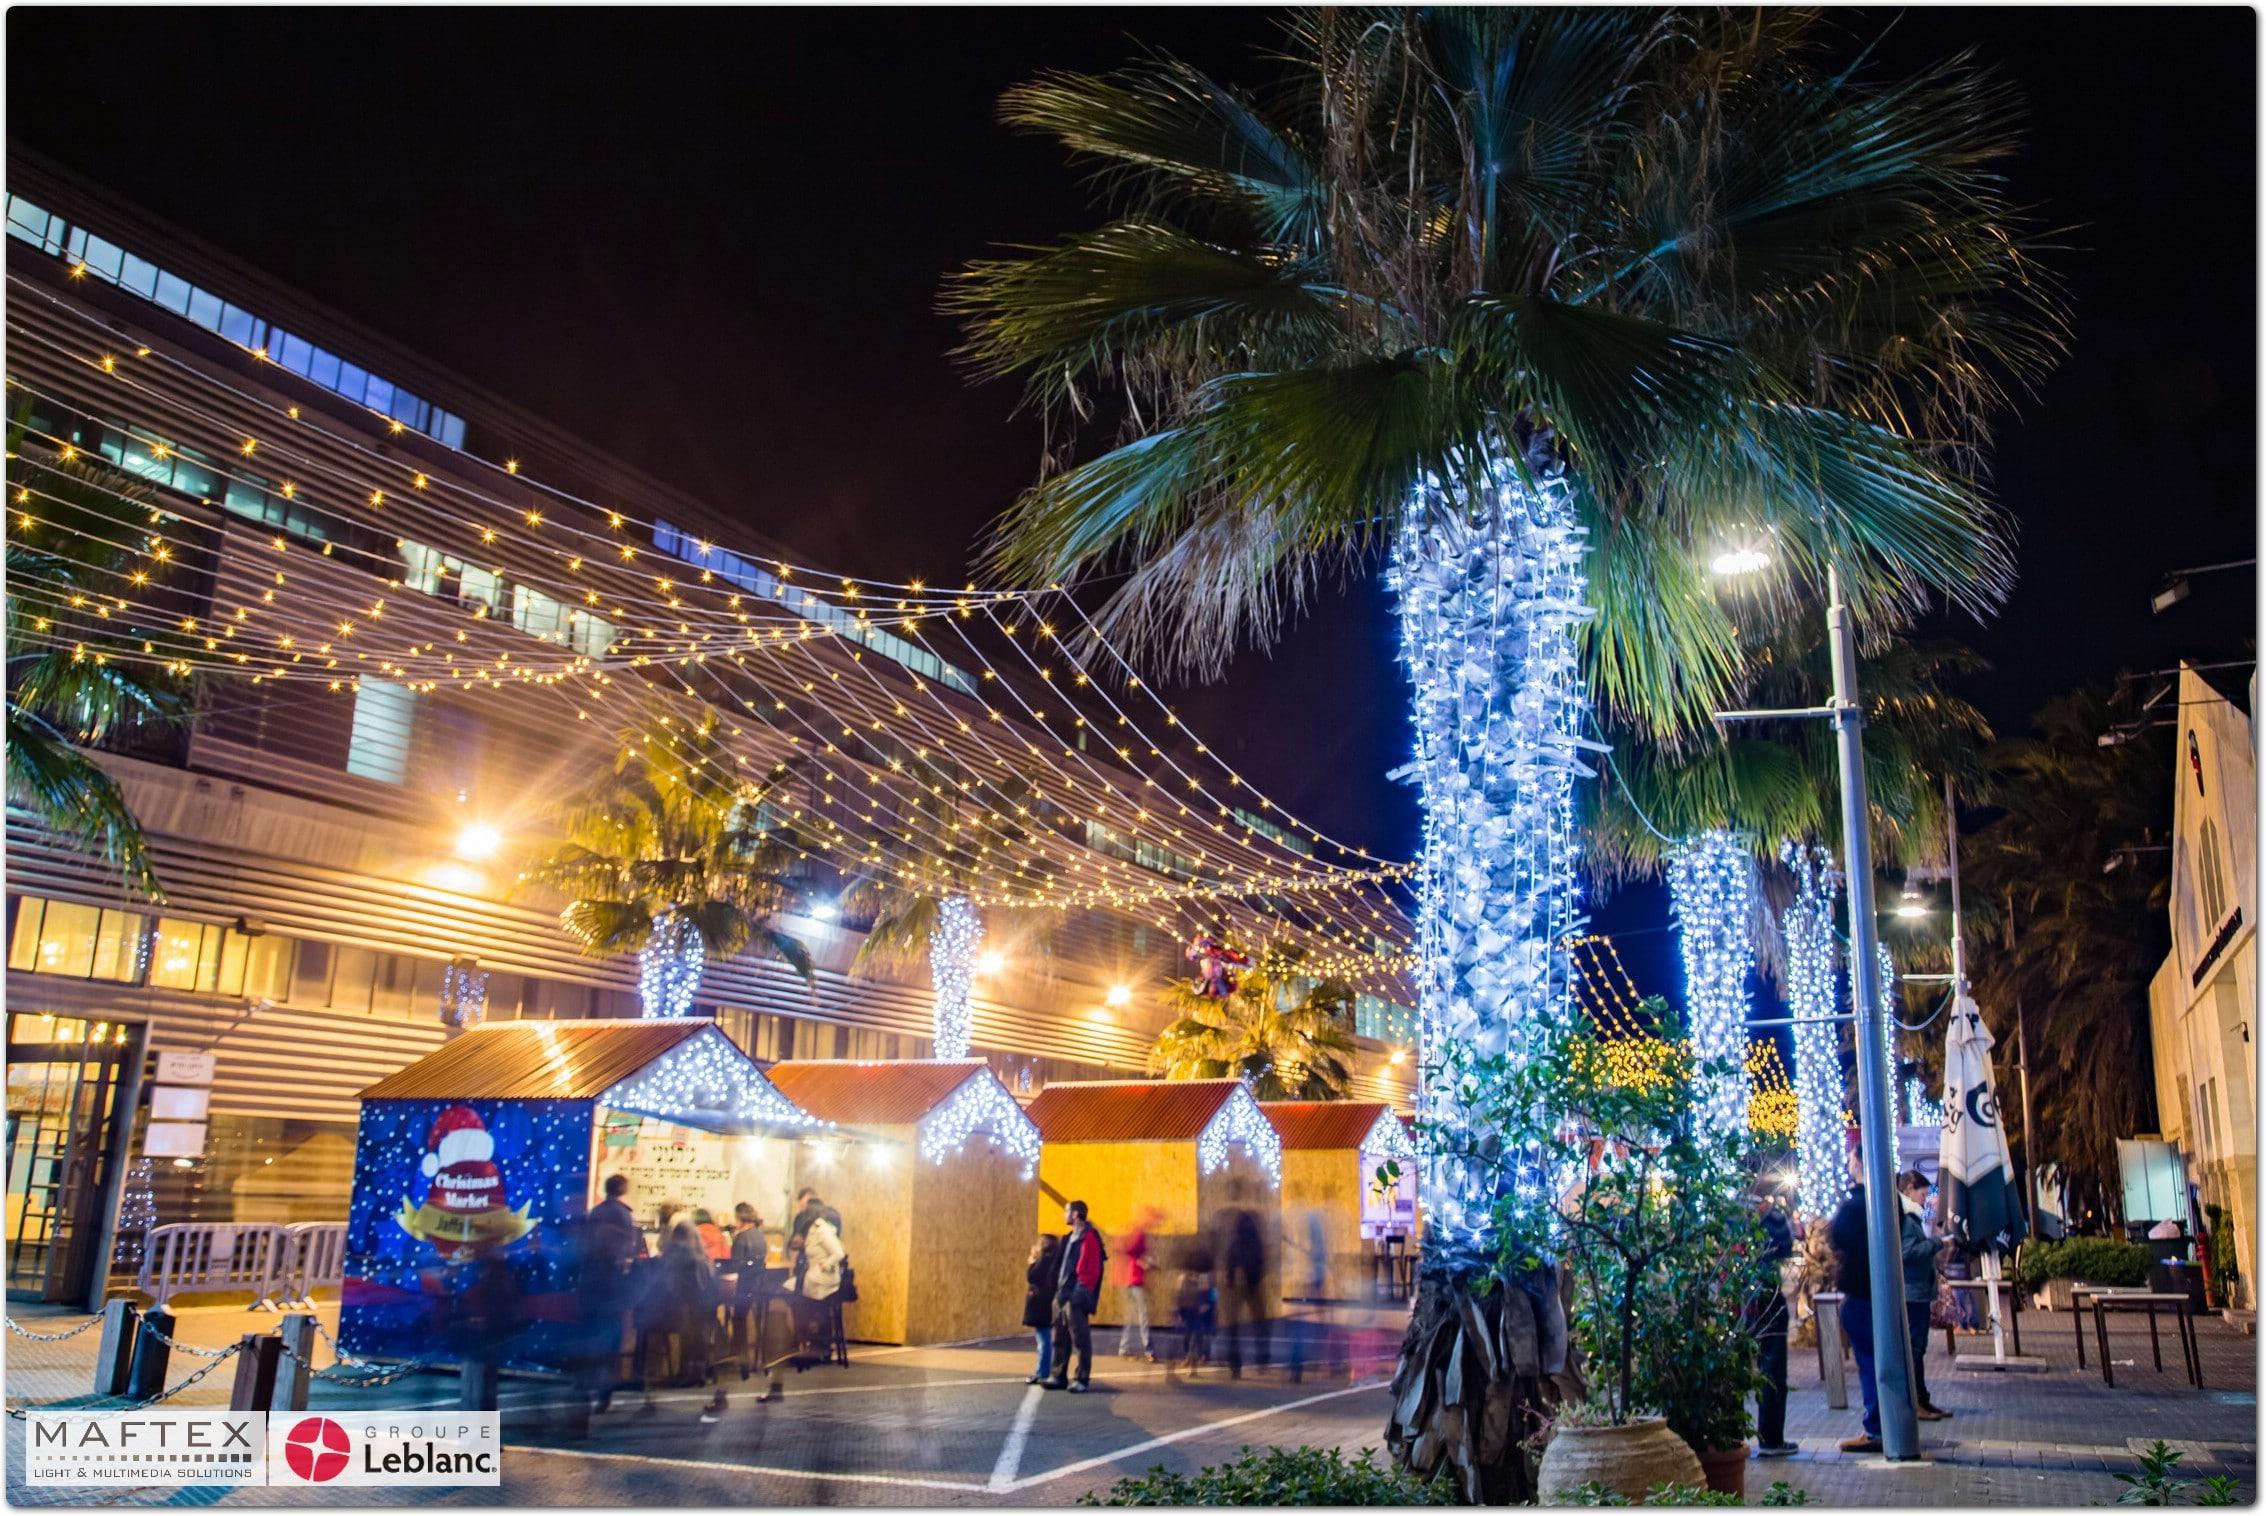 JAFFA Christmas Market Lights (8)